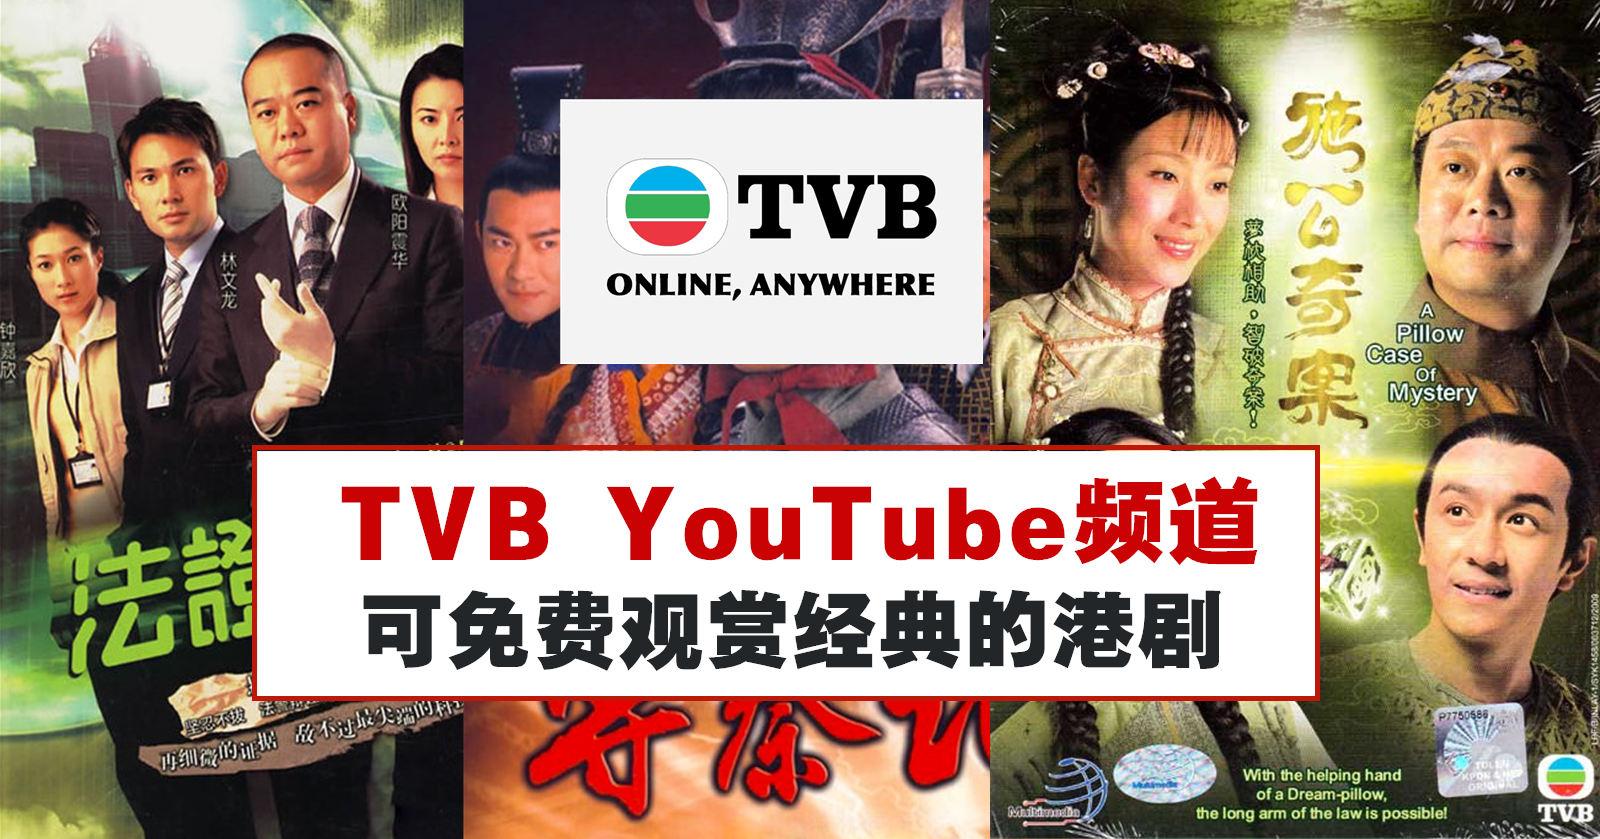 TVB YouTube频道,可免费观赏经典的港剧